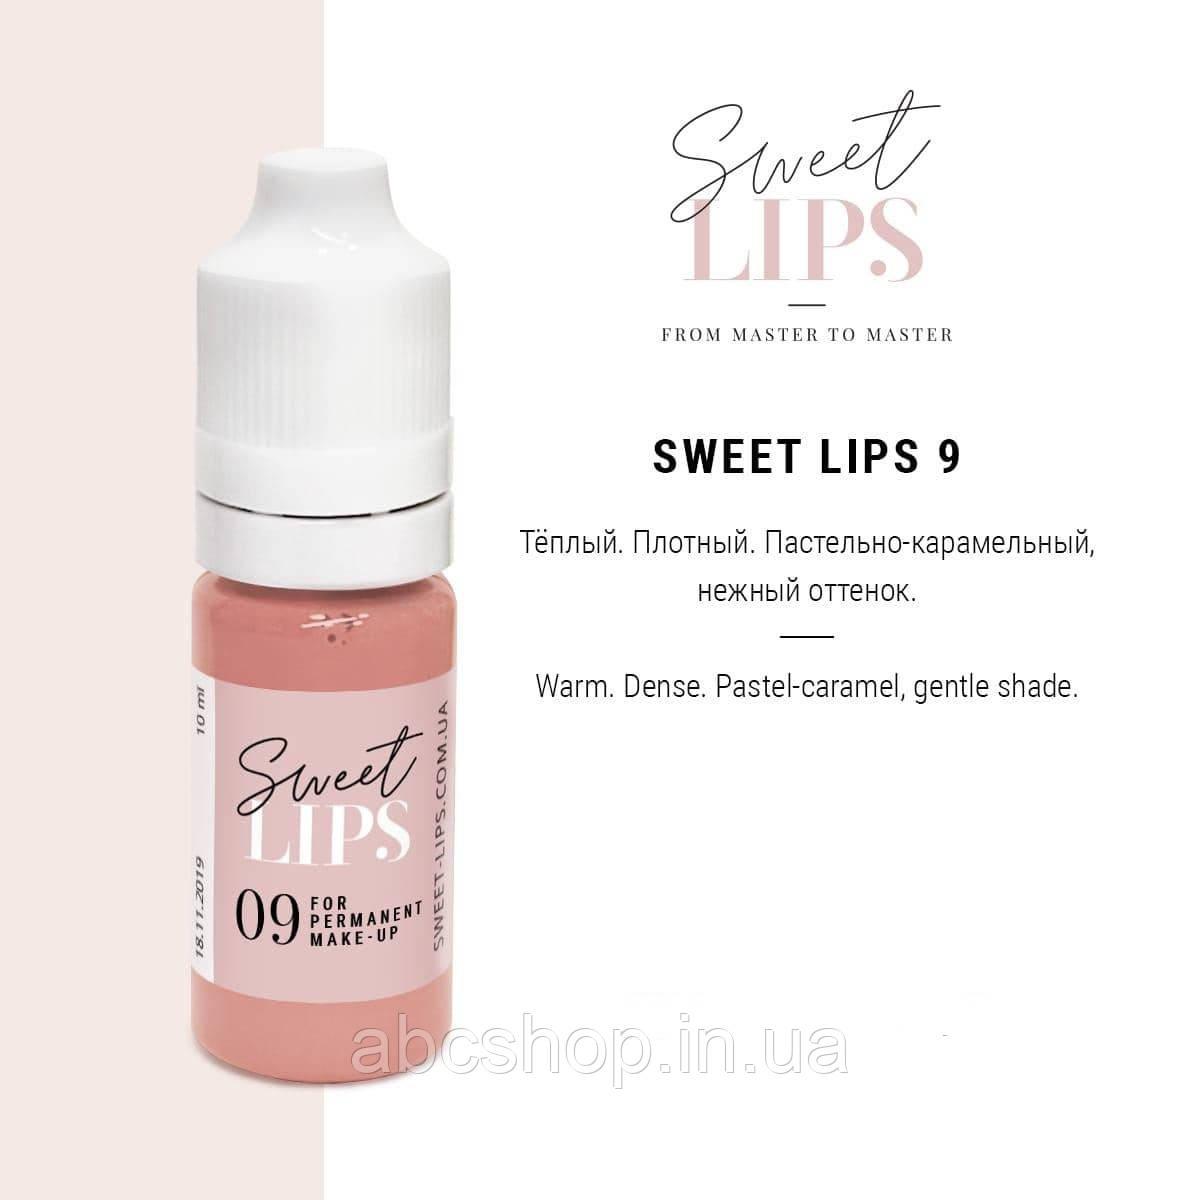 Пигмент Sweet Lips 09 (10мл)